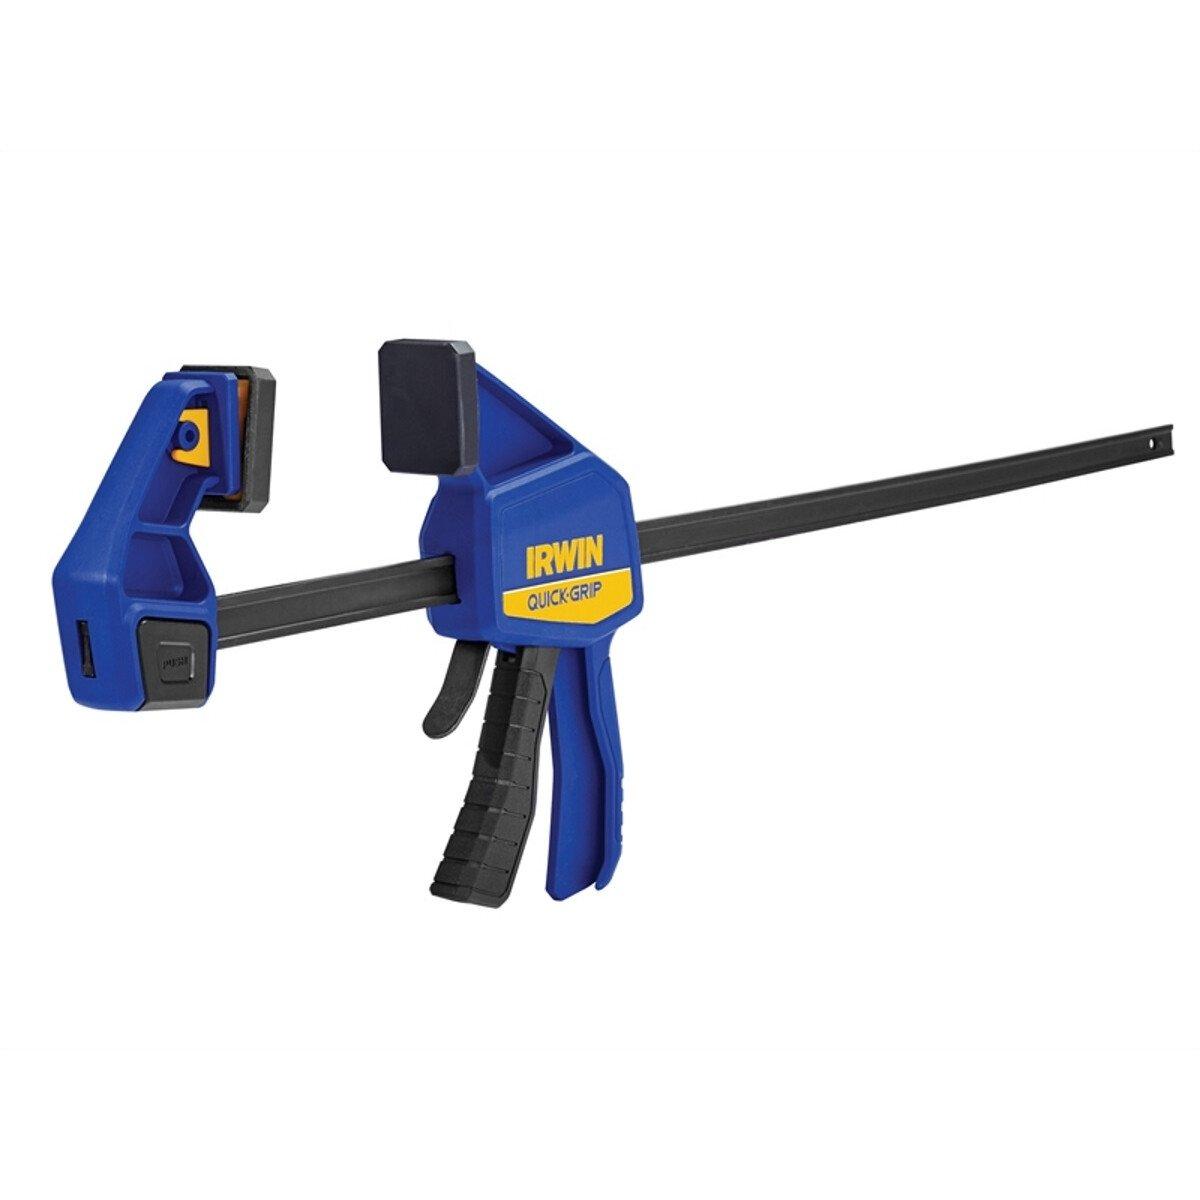 "Irwin Quick-Grip T524QCEL7 Bar Clamp/Spreader 610mm (24"") Quickgrip Q/G524QC"